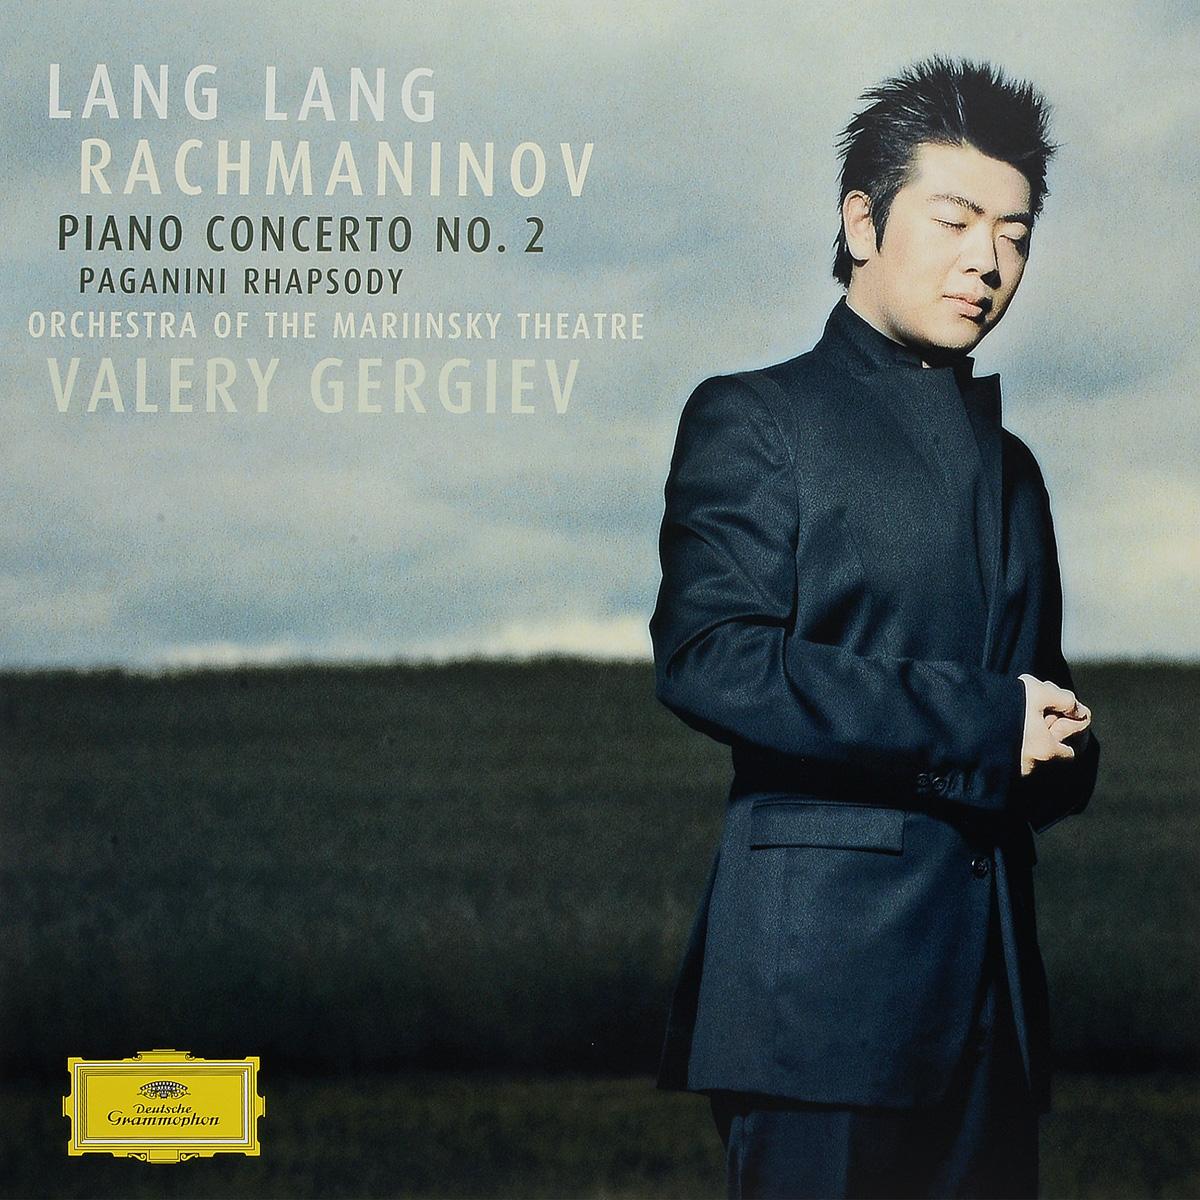 Rachmaninov. Lang Lang, Orchestra Of The Mariinsky Theatre, Valery Gergiev. Piano Concerto No. 2 / Paganini Rhapsody (2 LP) valery gergiev rachmaninov symphonic dances strawinsky symphony in three movements